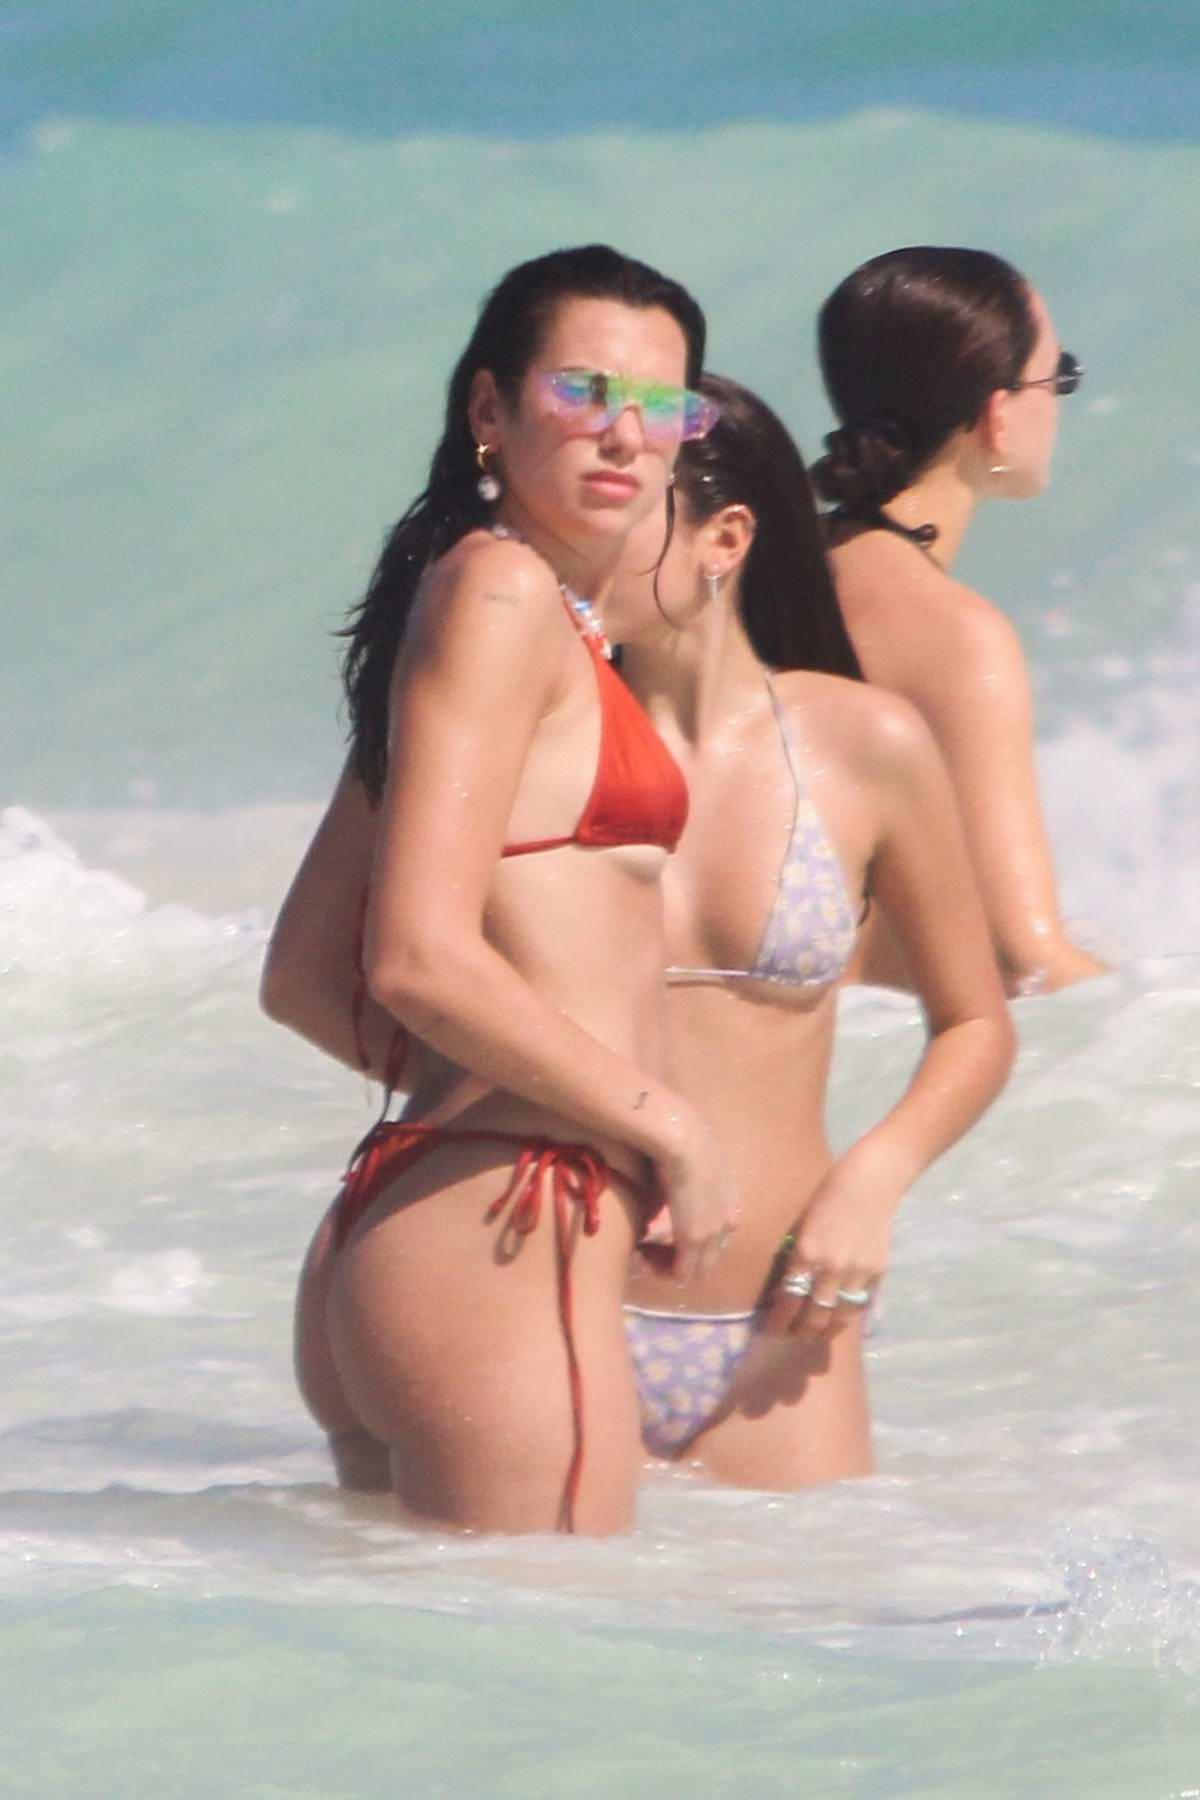 Dua Lipa shows off her sensational body in an orange bikini while enjoying the beach with friends in Tulum, Mexico